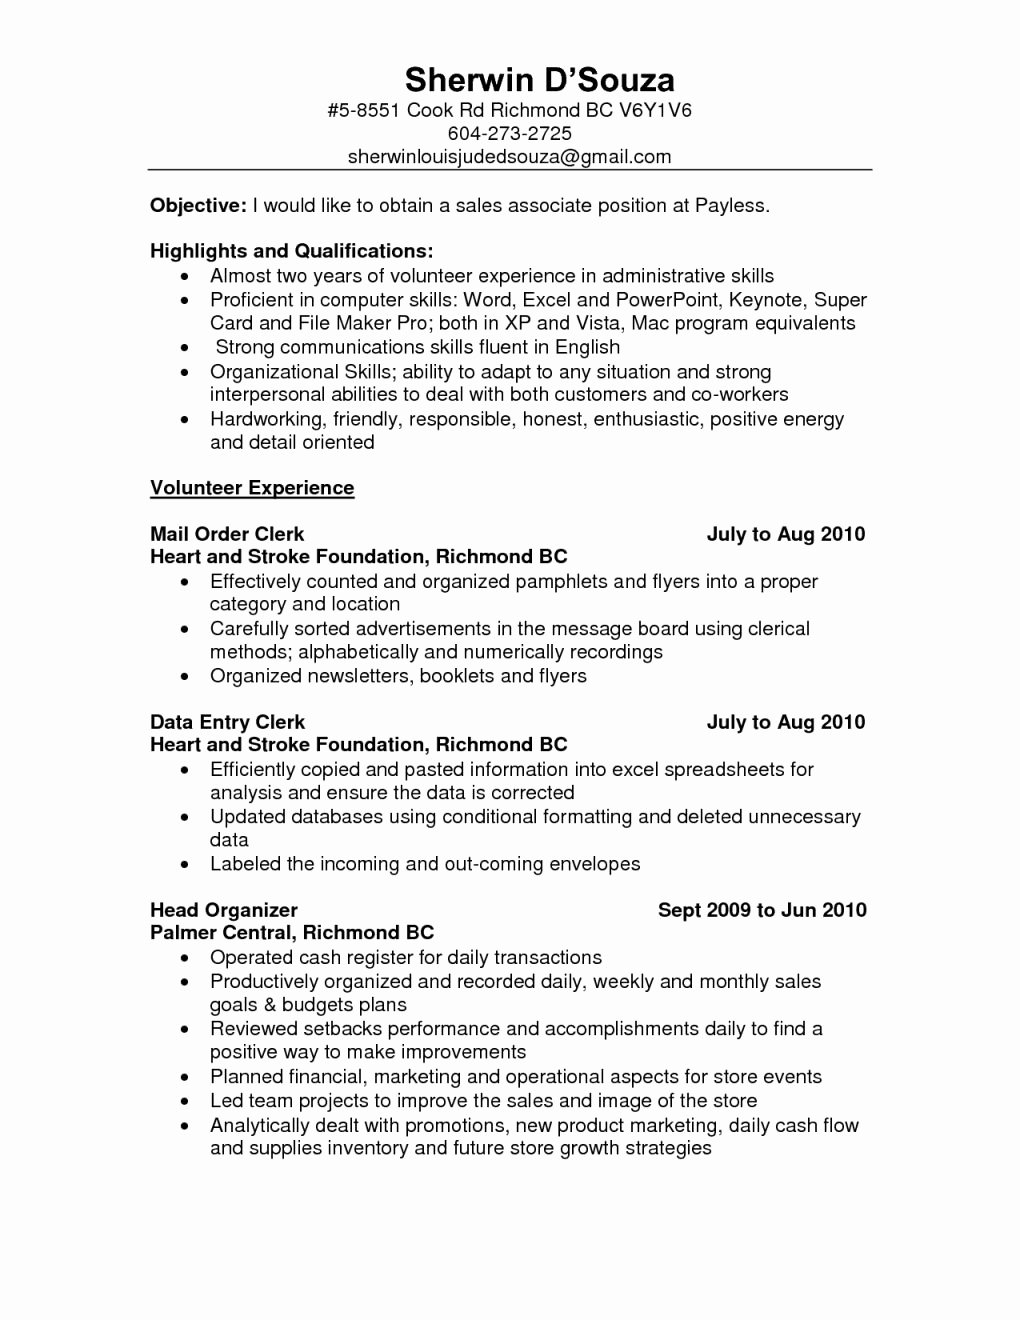 Resume Retail Sales associate Duties assistant Store